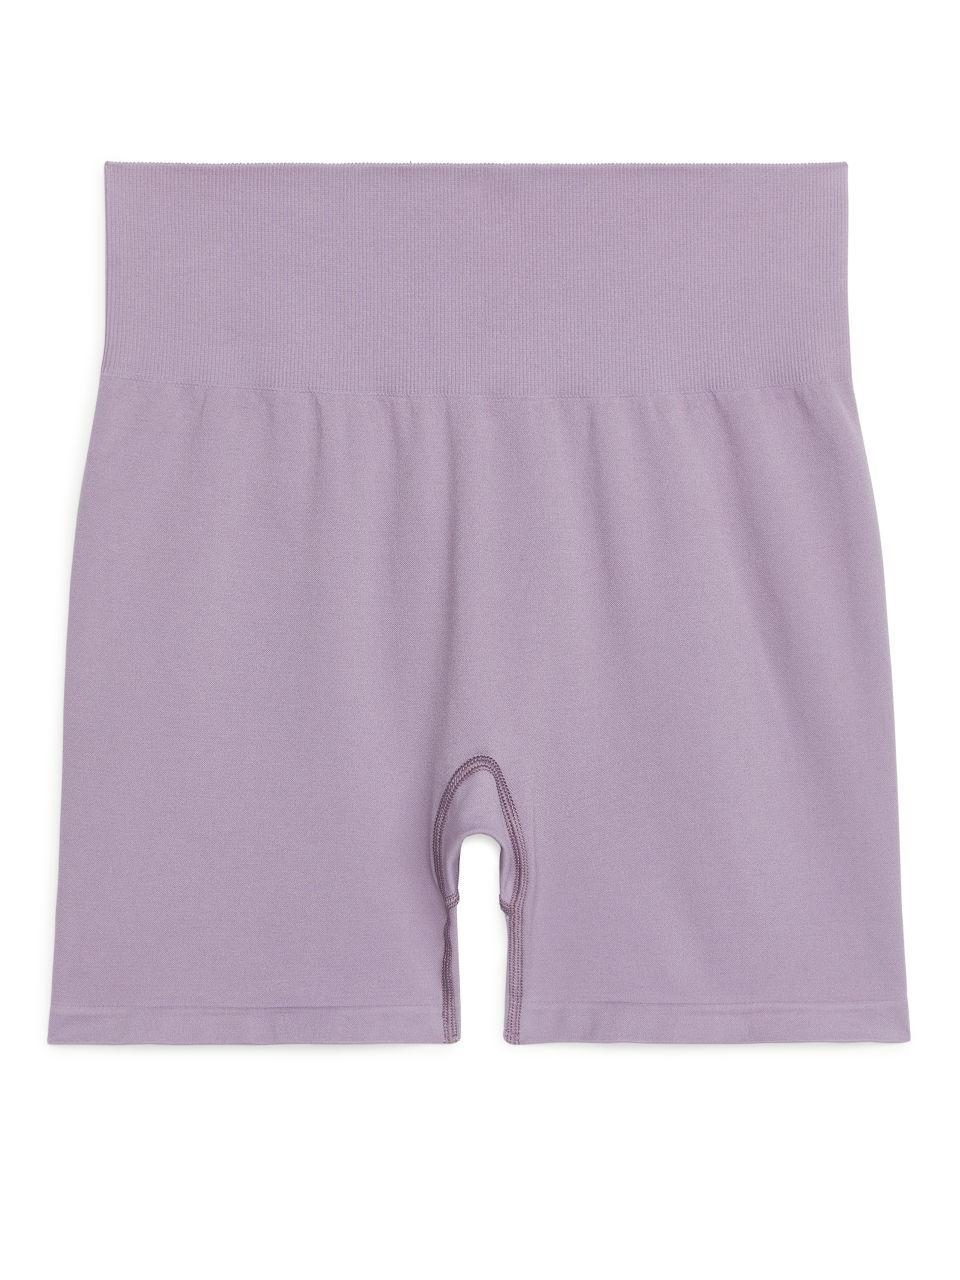 Seamless™ Yoga Shorts - Purple